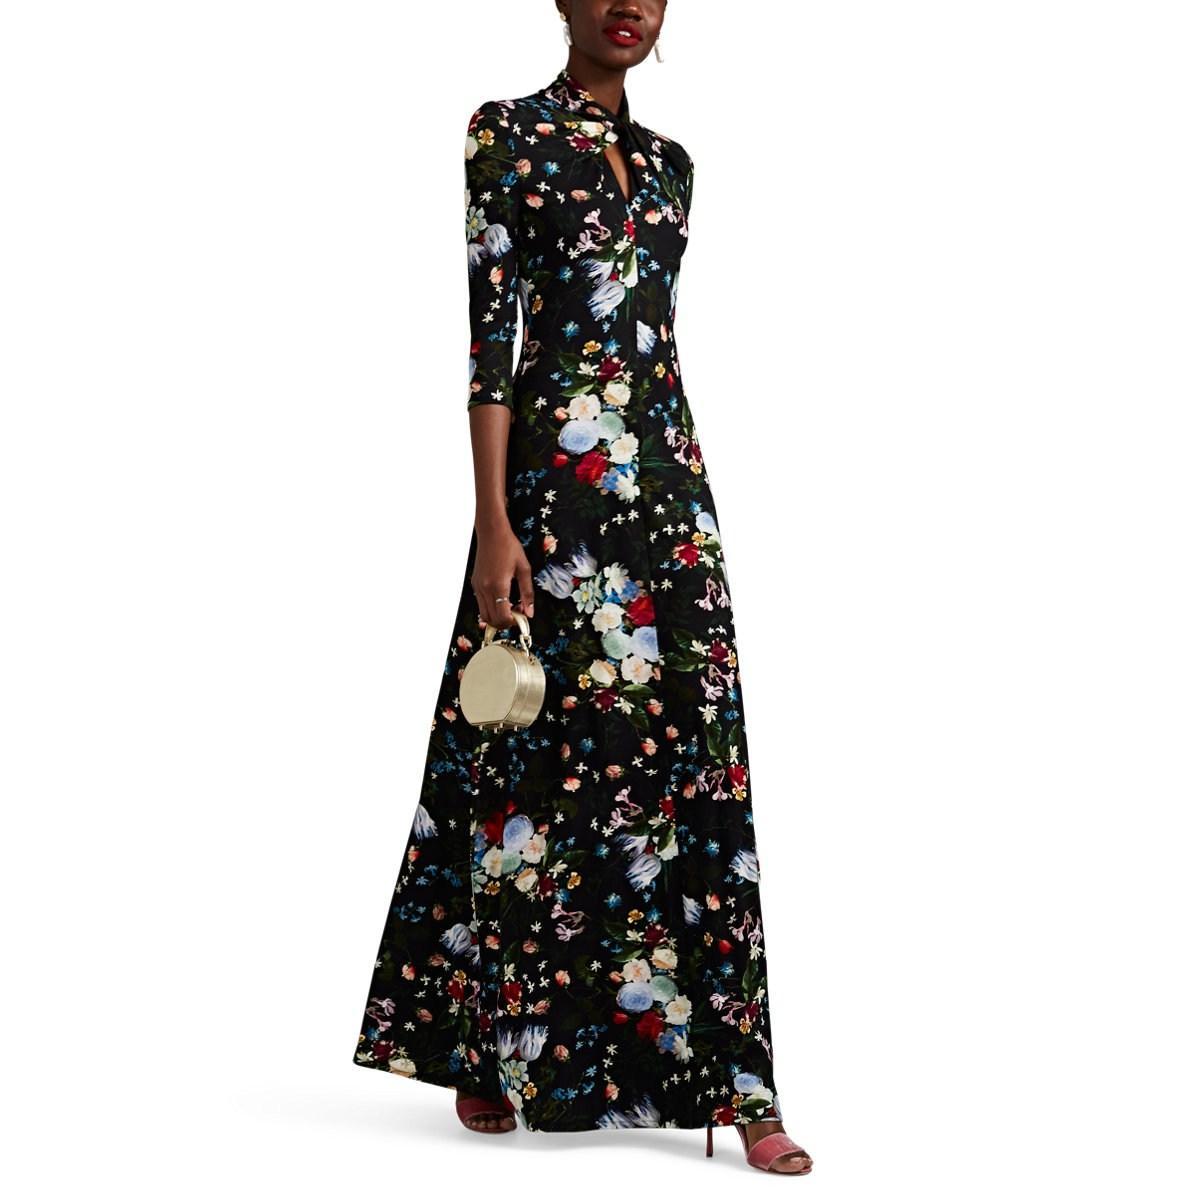 Nia Jersey Black Lyst Gown In Erdem Floral qTxnx8U